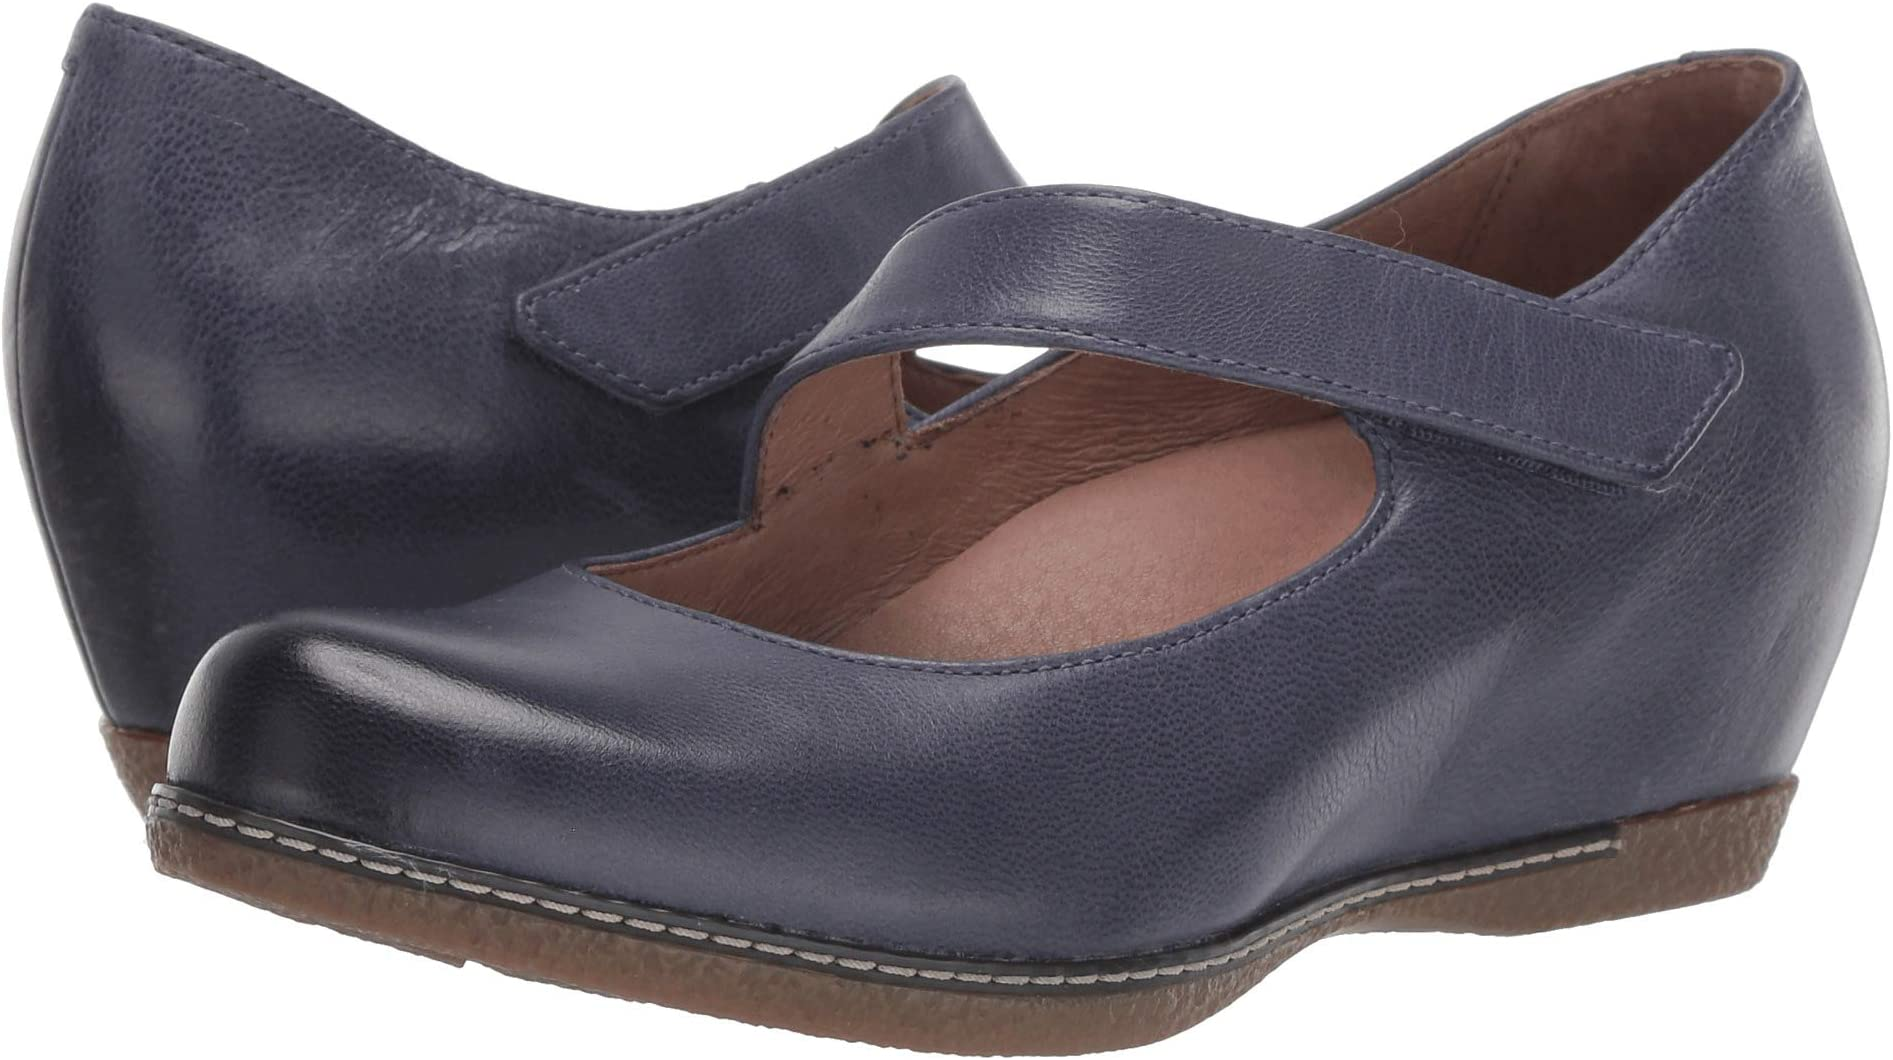 cfecd38c93464 Dansko Boots, Shoes, & Clogs | Zappos.com